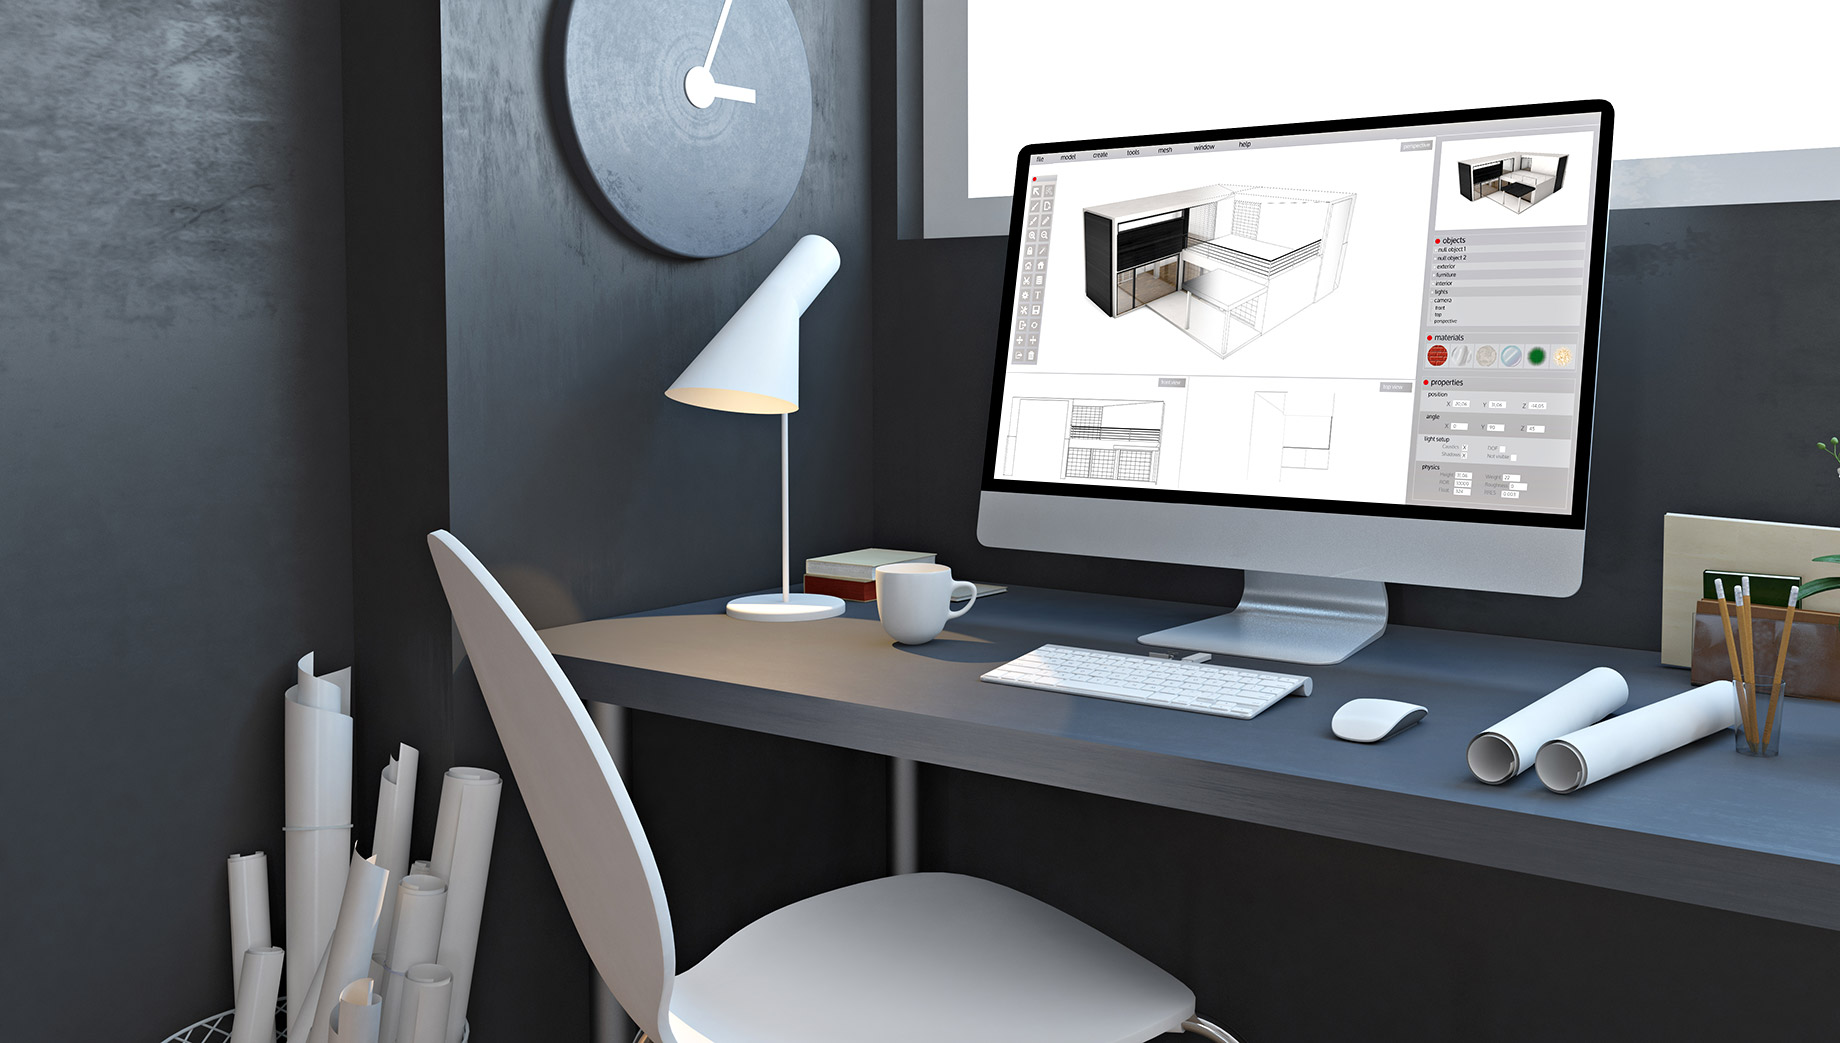 Home Design Software on iMac